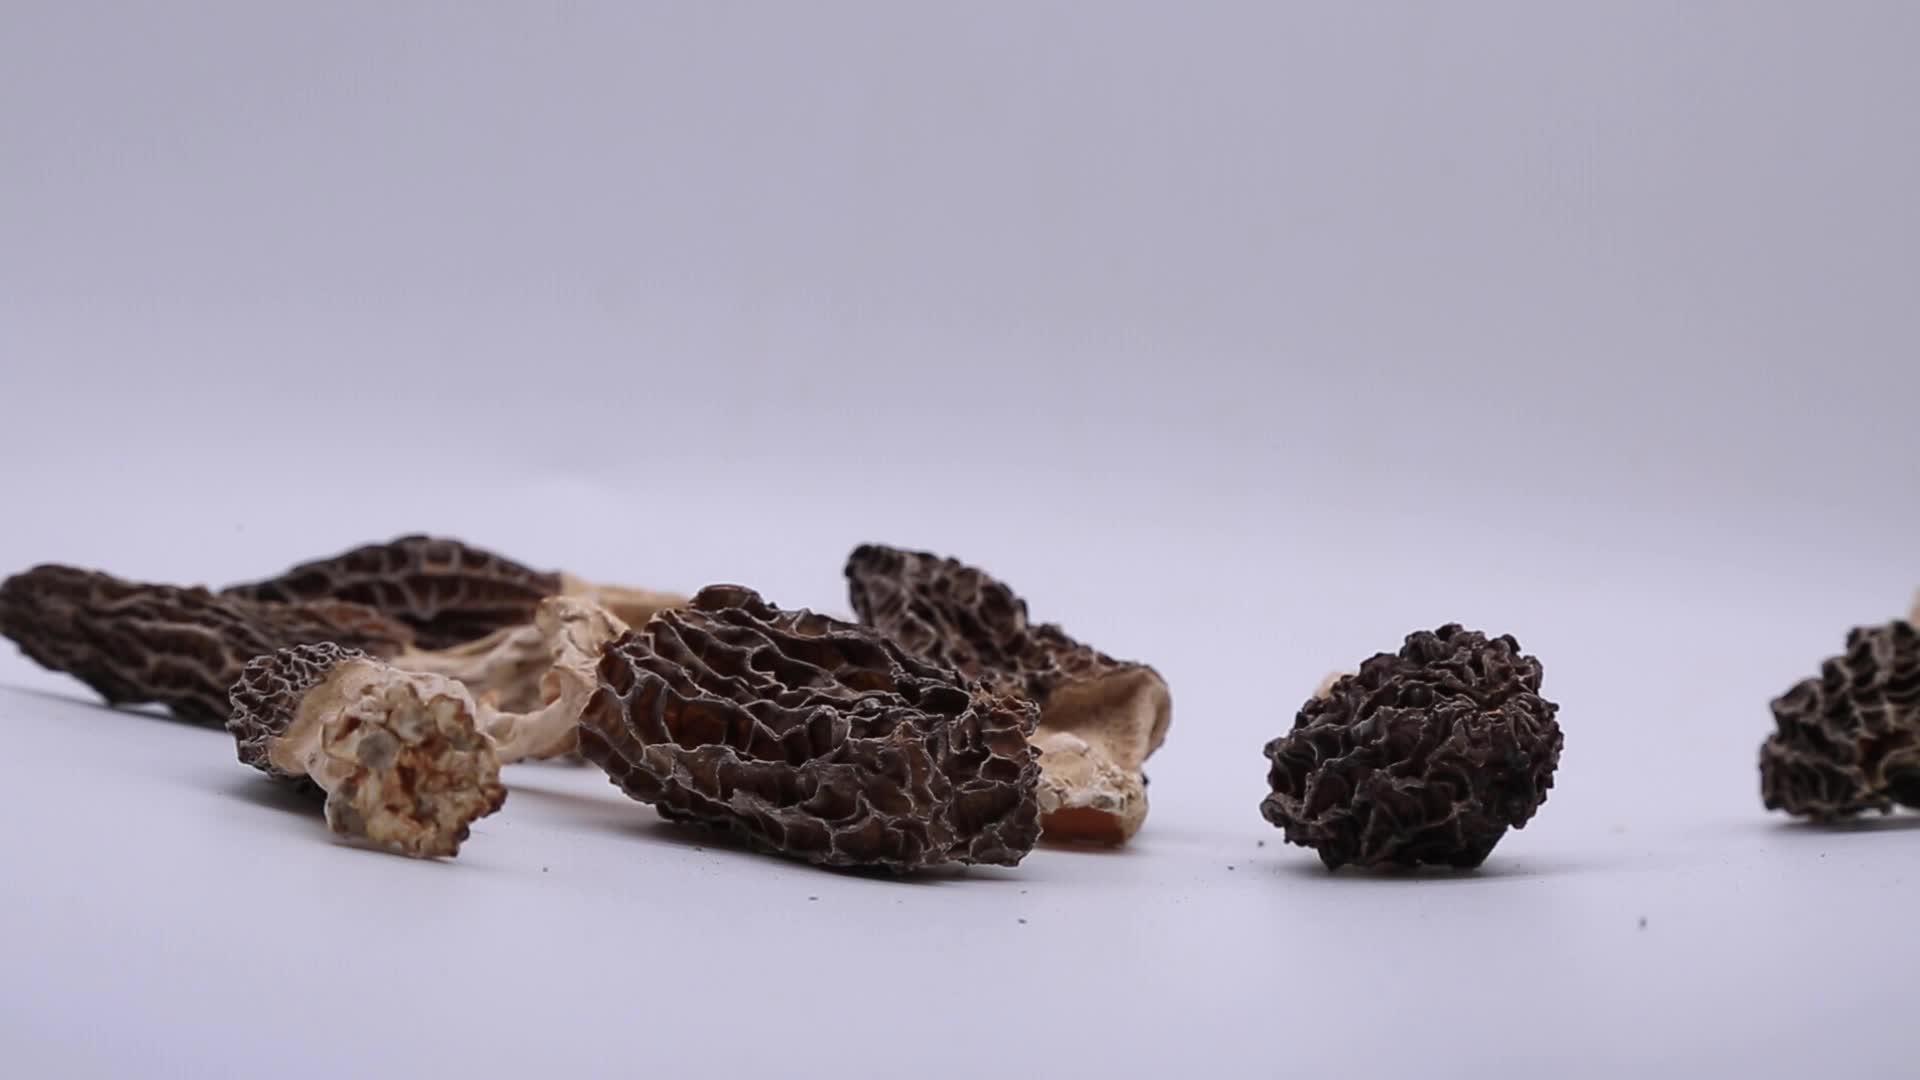 Selvagem Morchella Esculenta Secas Preto/Cogumelos Morel para Venda